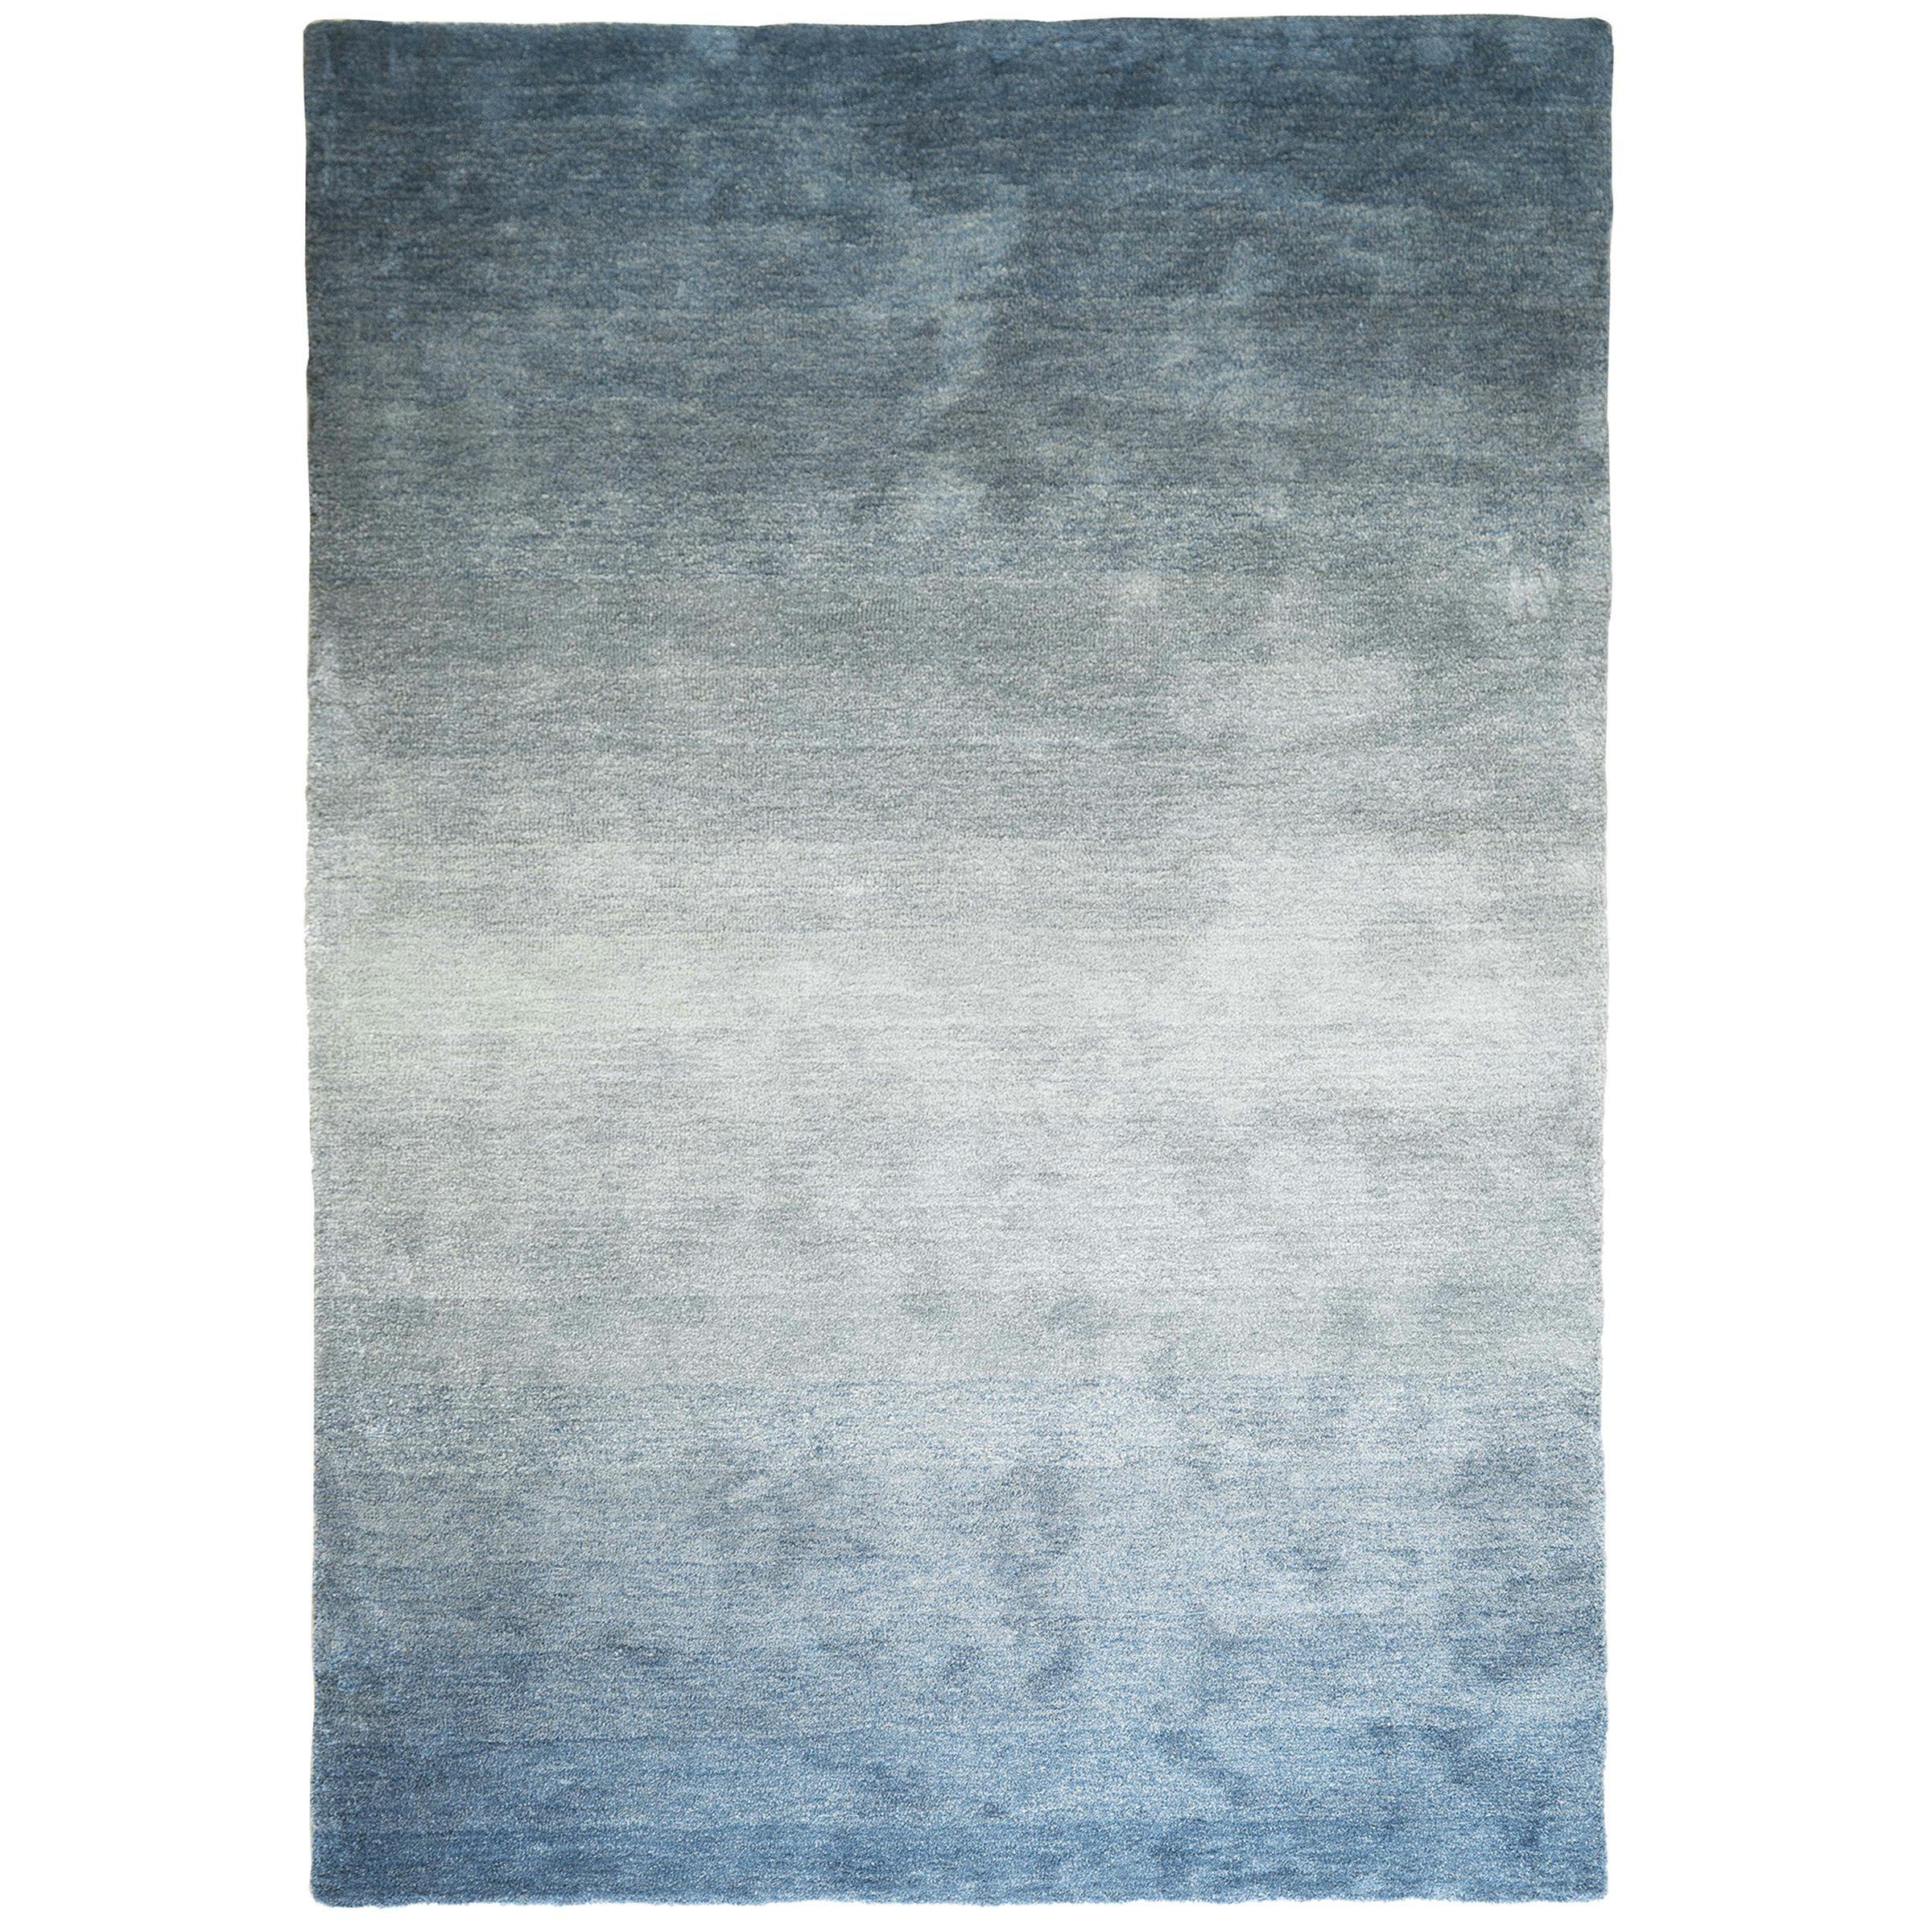 Vloerkleed Holger blauw/groen 160x230 cm Ковры